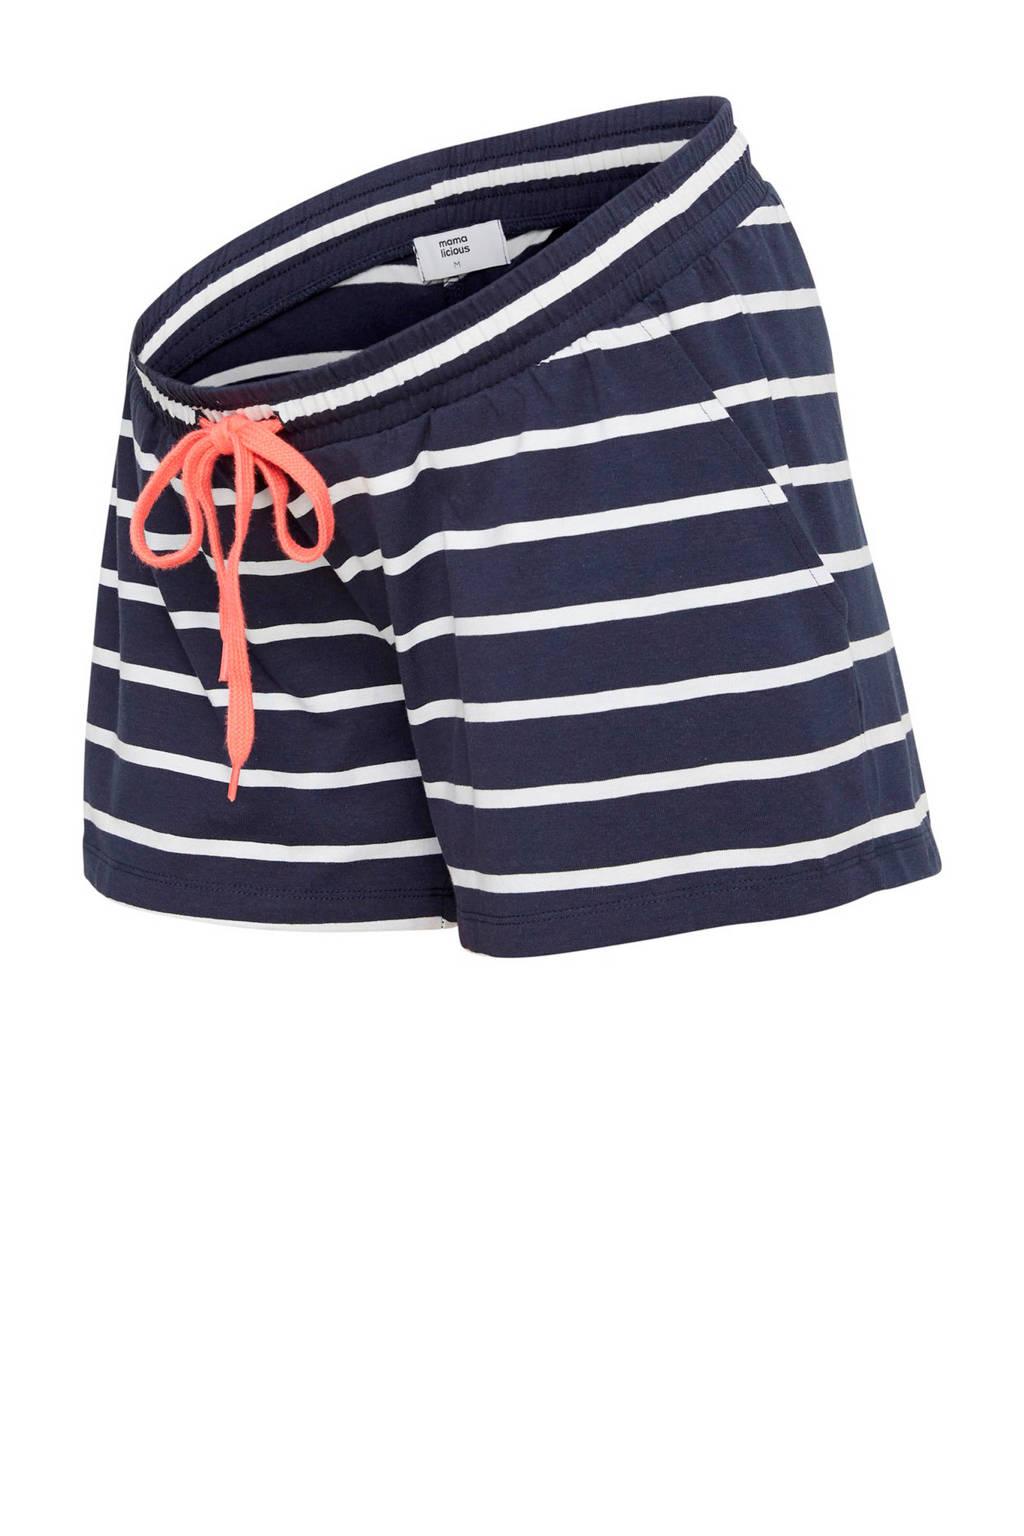 MAMA-LICIOUS zwangerschaps korte broek donkerblauw, Donkerblauw/wit